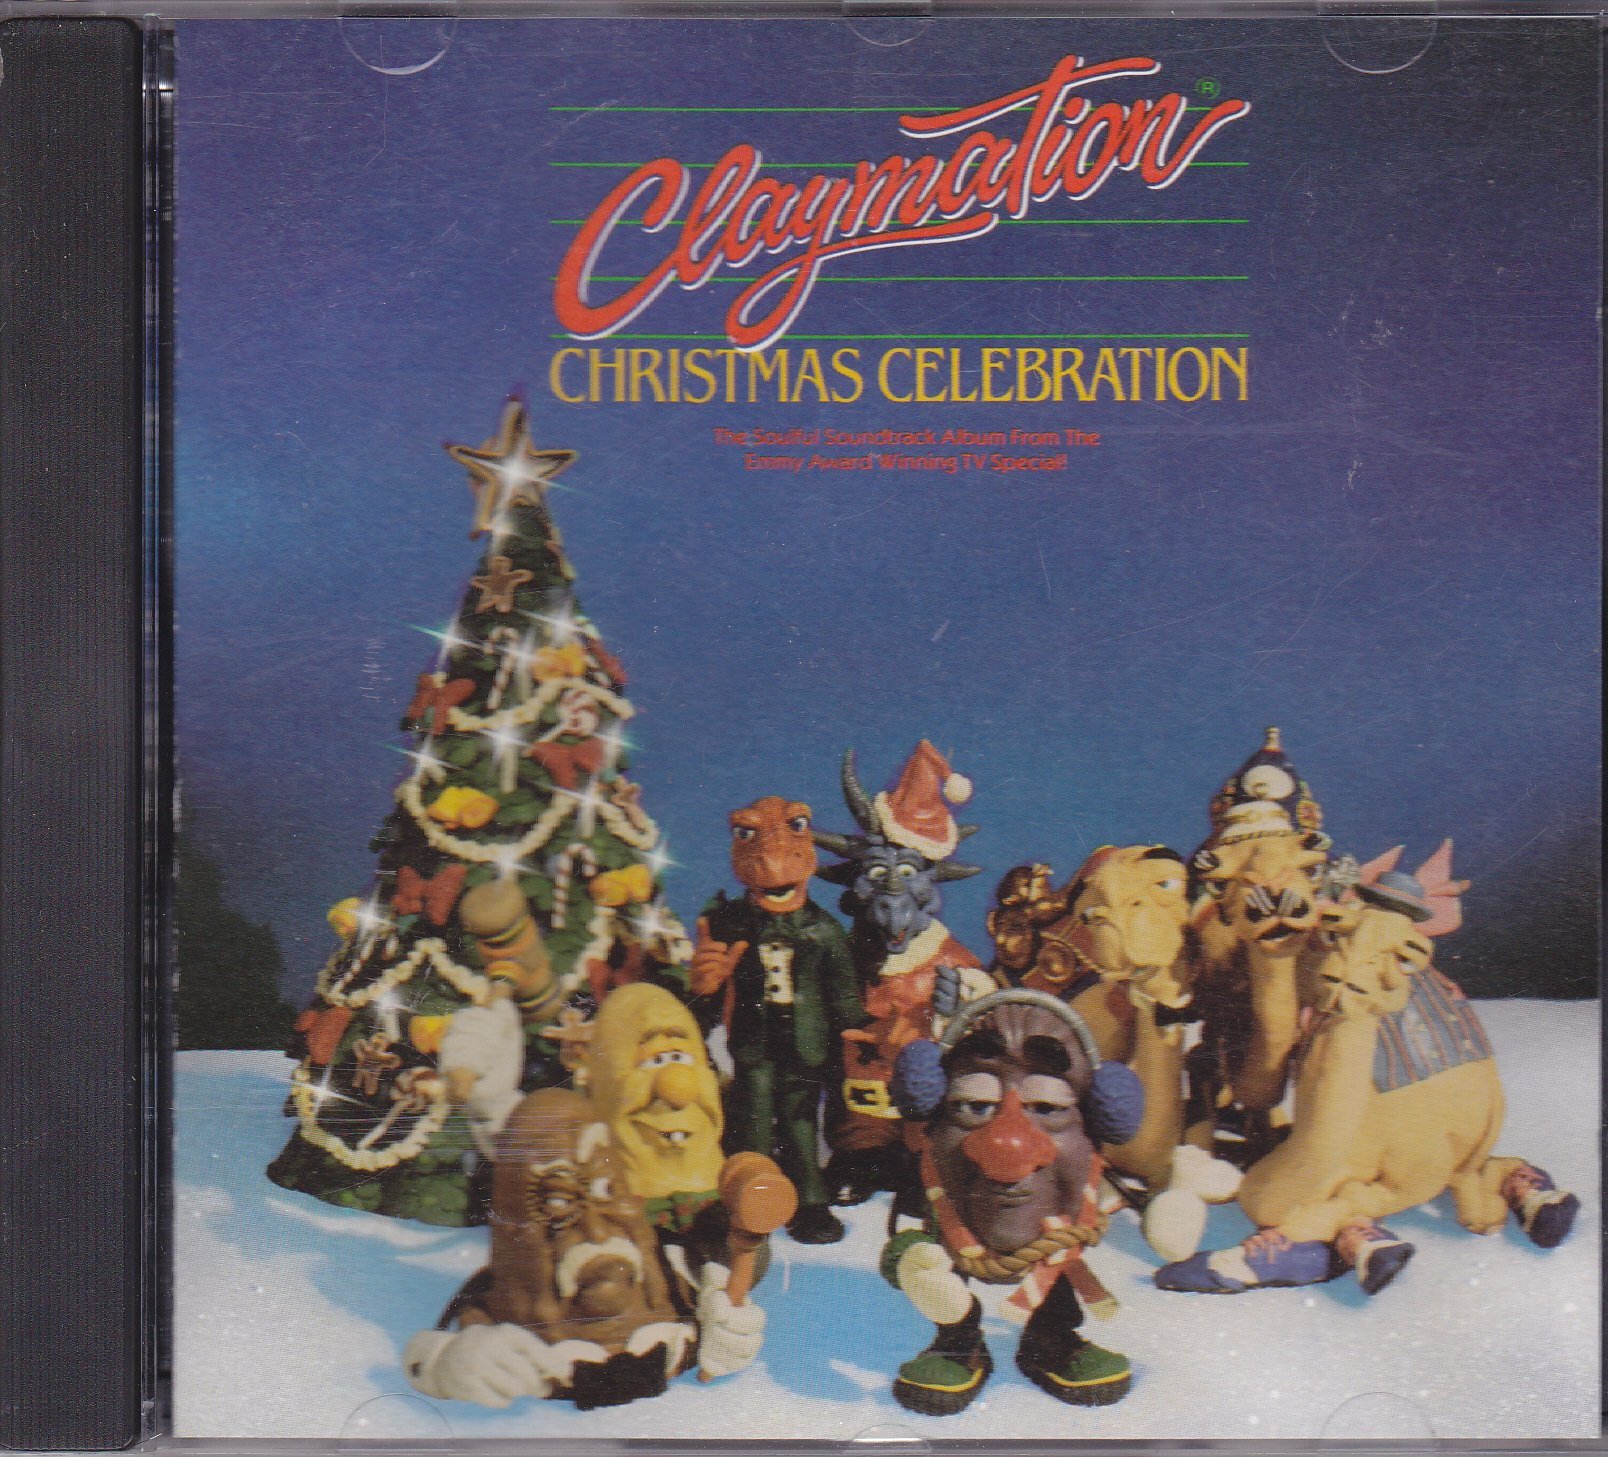 Claymation Christmas Celebration